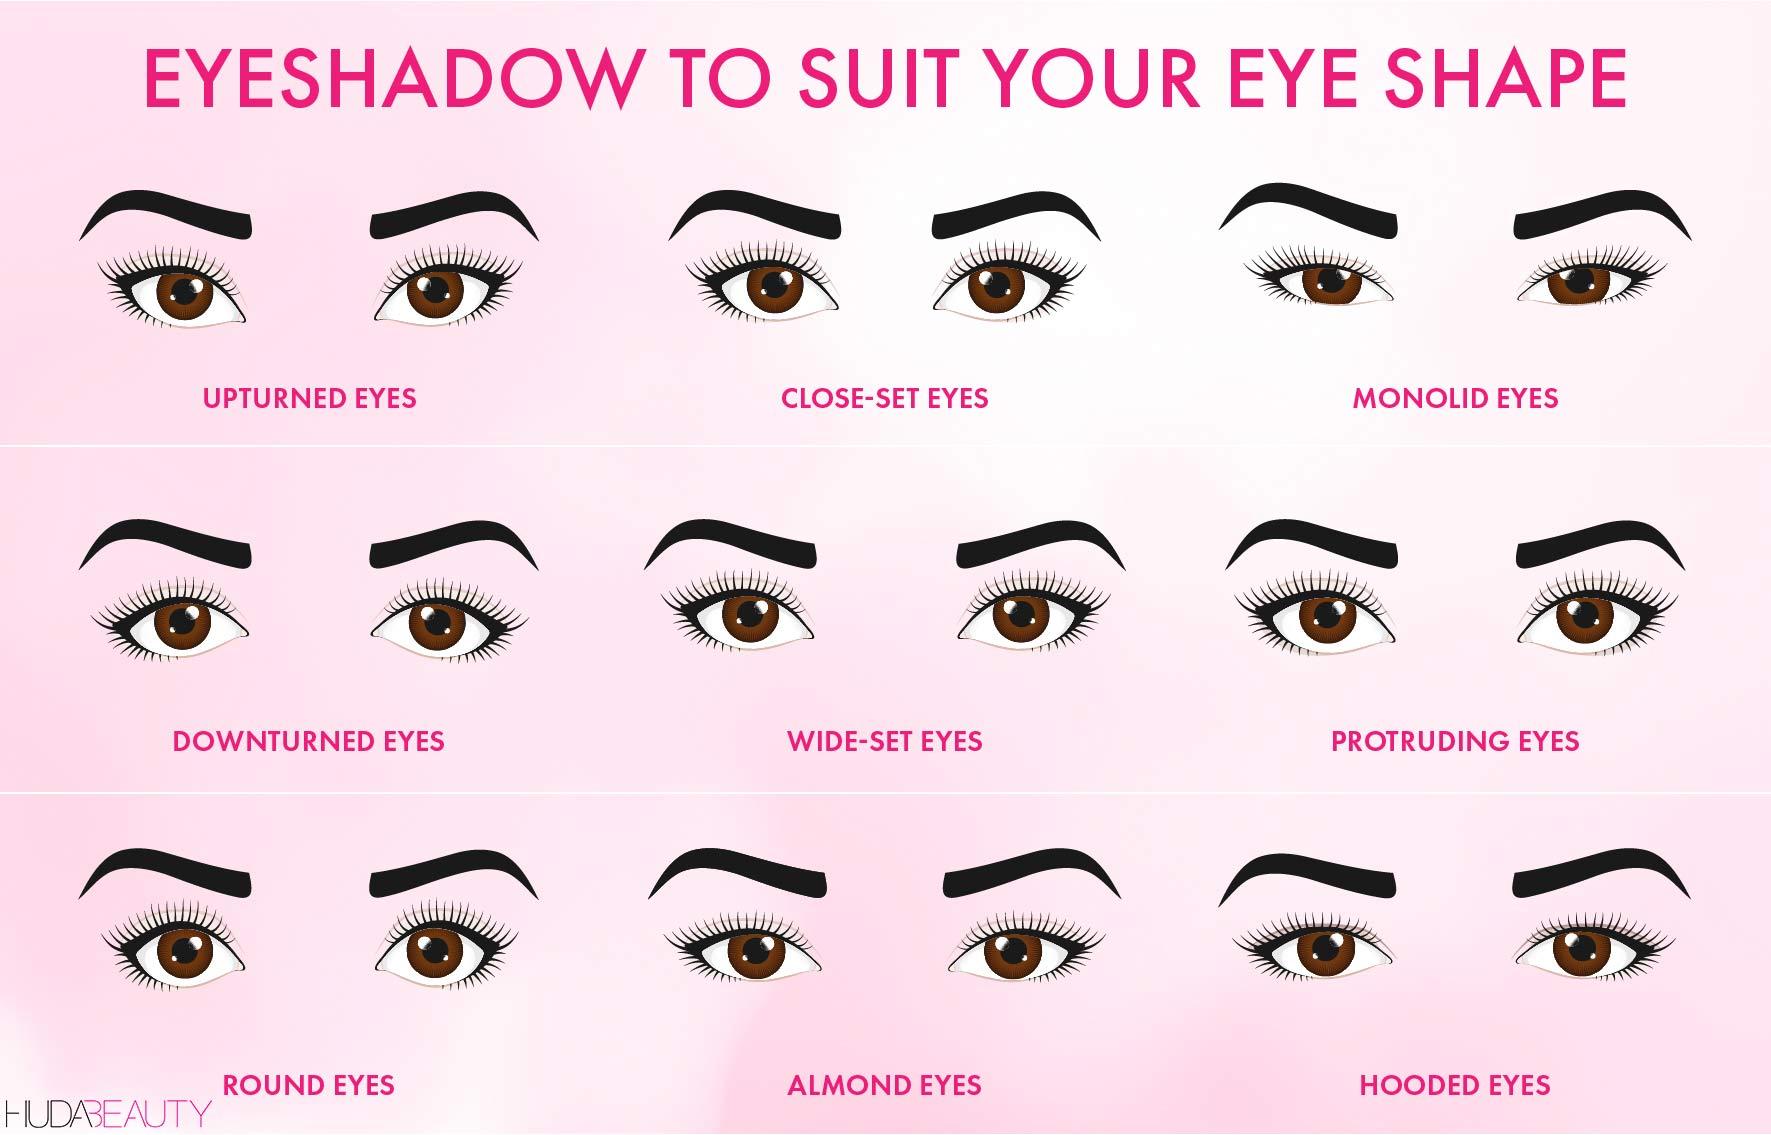 Eyeshadow Tips To Flatter Every Single Eye Shape  Blog  HUDA BEAUTY